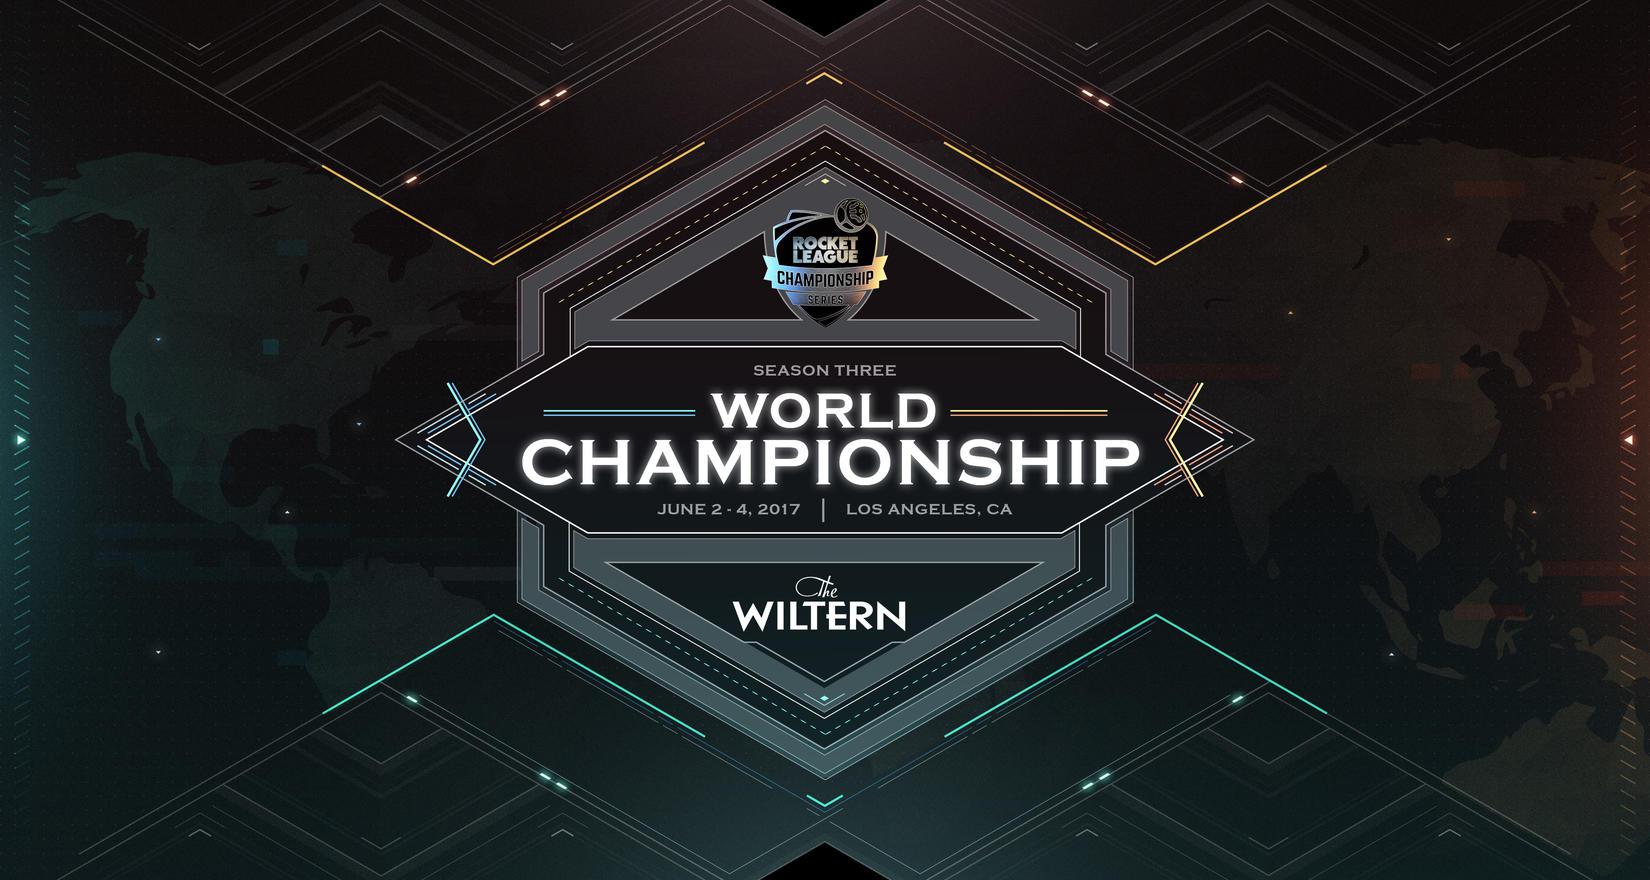 RLCS Season 3 World Championship Tickets on Sale This Wednesday Image